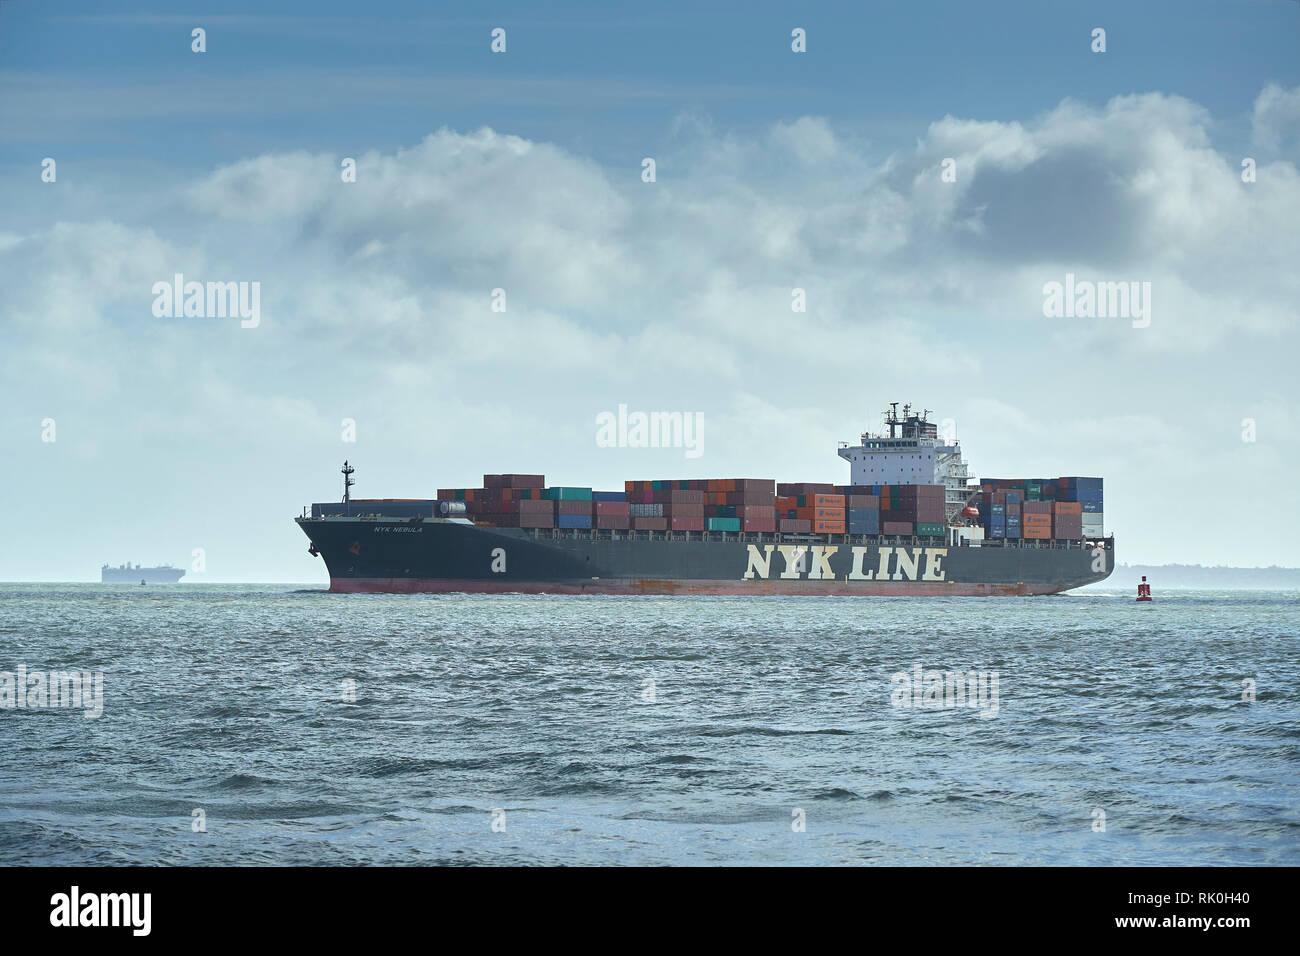 NYK LINE Container Ship, NYK NEBULA, Approaching The Port Of Southampton, United Kingdom, 7 February 2019 - Stock Image